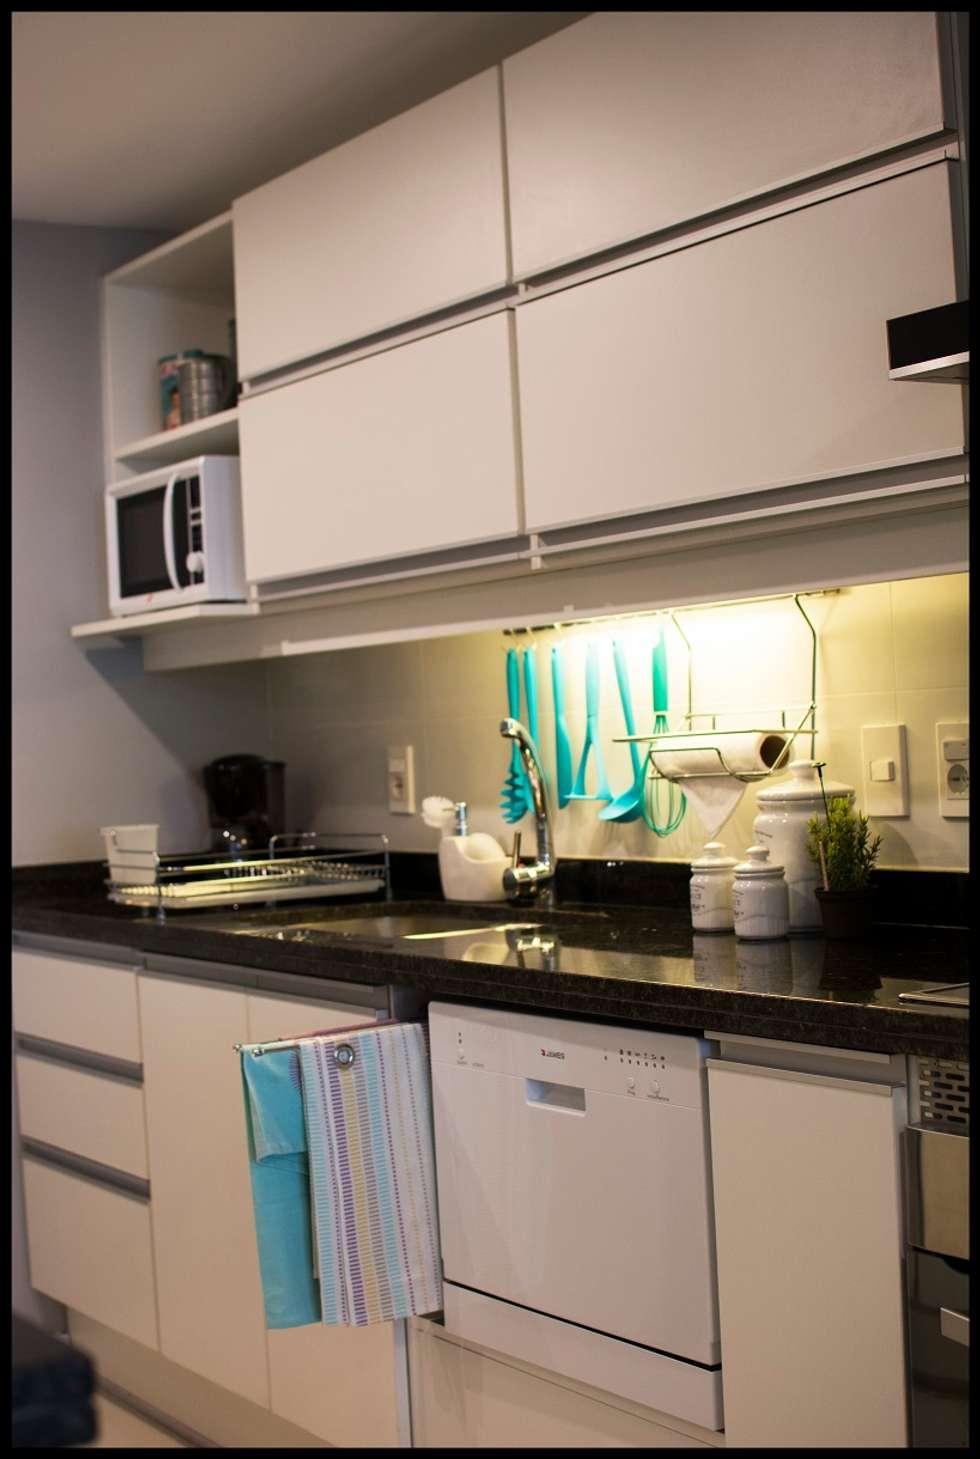 Cocina integrada: Cocinas de estilo ecléctico por Diseñadora Lucia Casanova